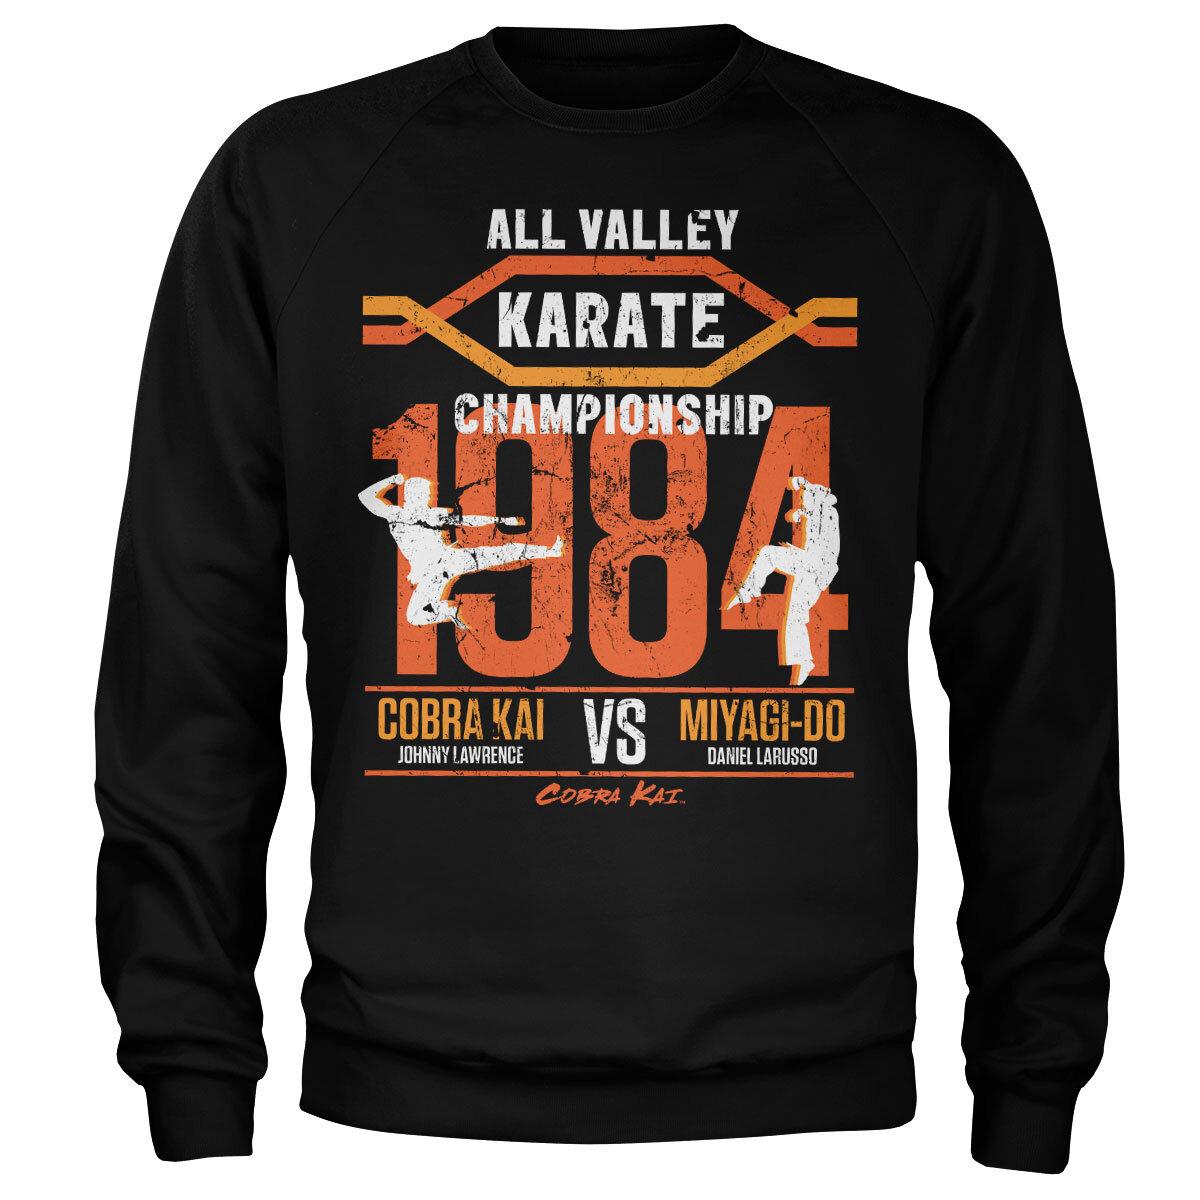 All Valley Karate Championship Sweatshirt